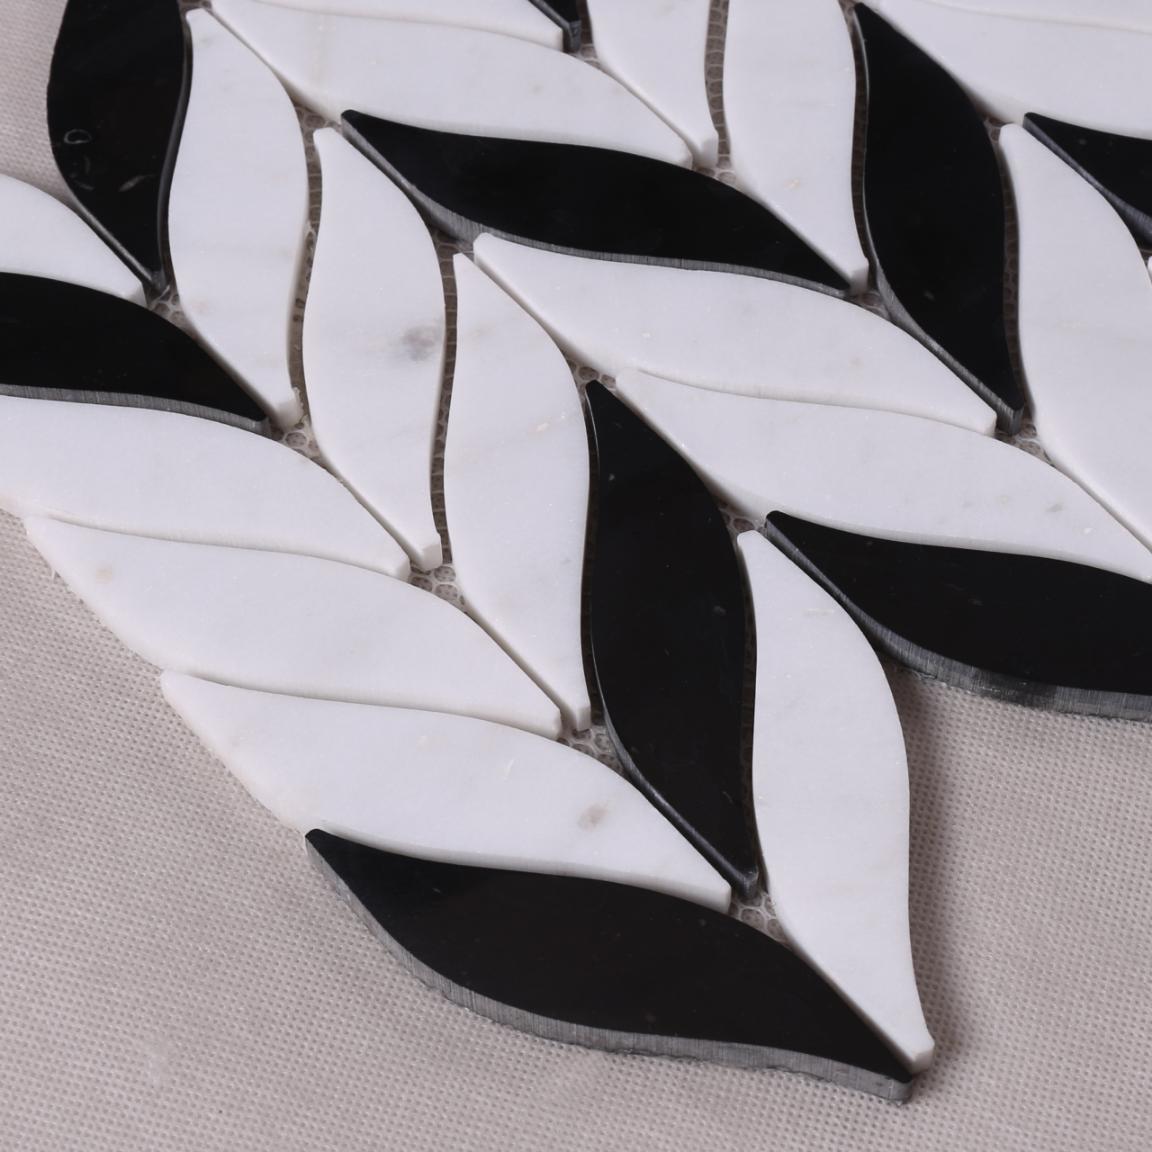 Leaf Design Natural Stone Mosaic Tile for Background Wall Decoration HSC04